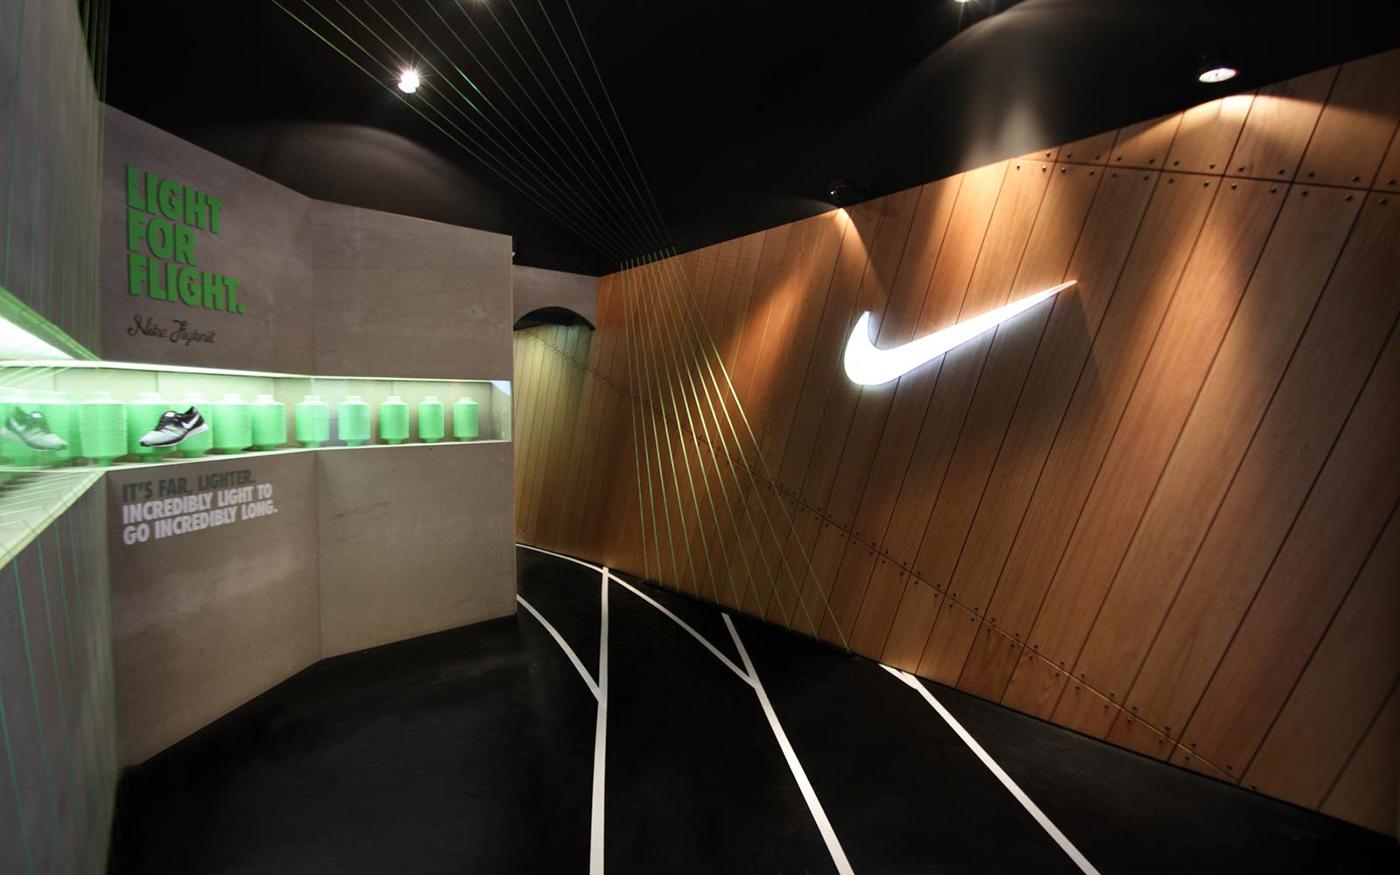 barcelona nike olympic games pop up store on behance. Black Bedroom Furniture Sets. Home Design Ideas